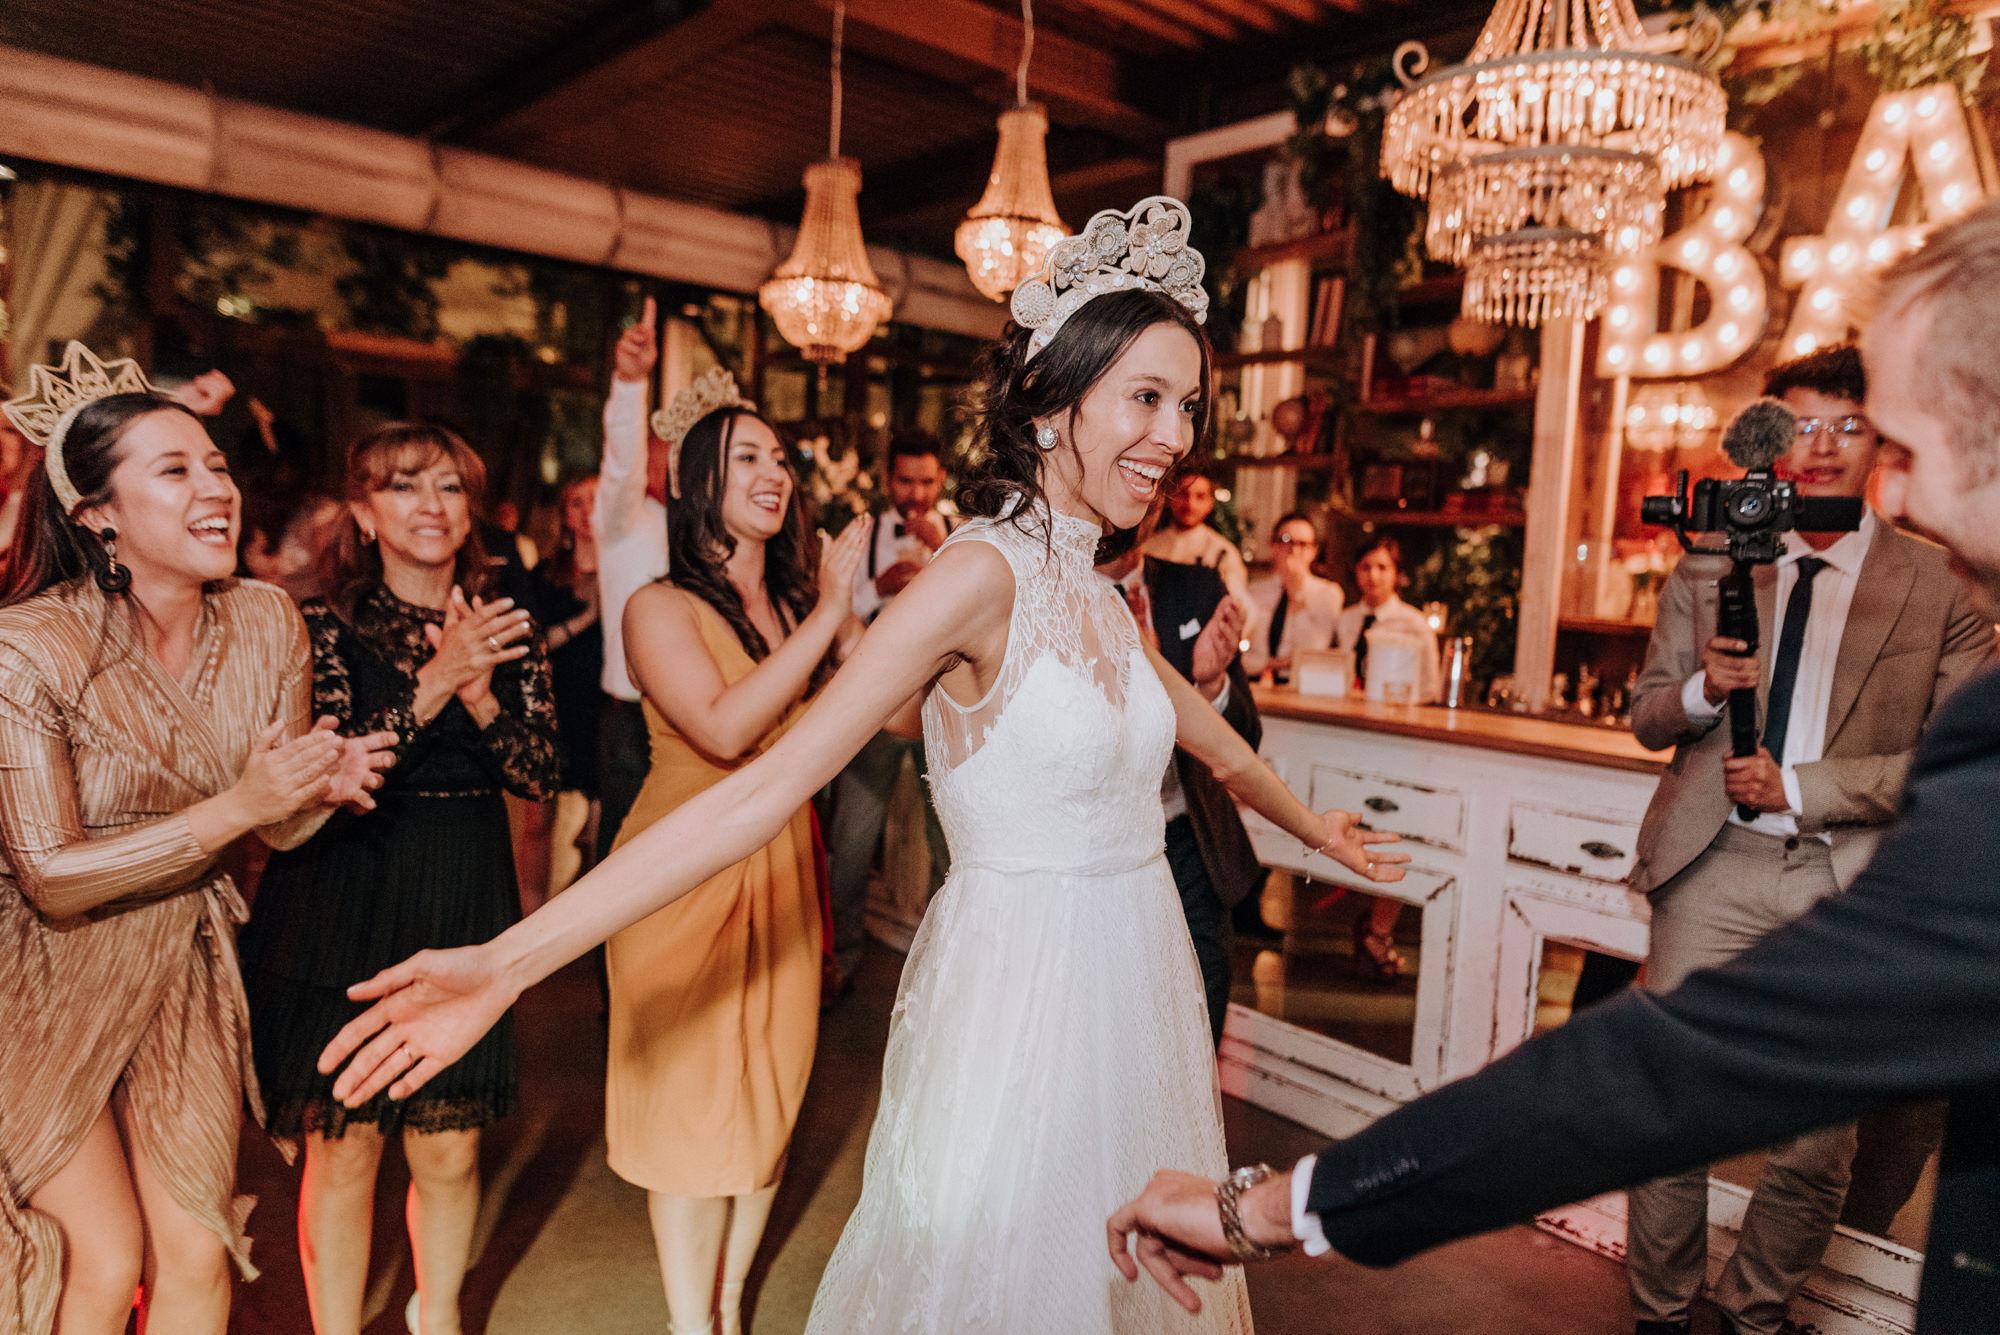 FOTO+PHOTO+BODA+WEDDING+ITALIA+ITALY+MAURICIO+GARAY+MAURICIOGARAY+WEDDINPHOTOGRAPHER+FOTOGRAFODEBODA-2114.jpg